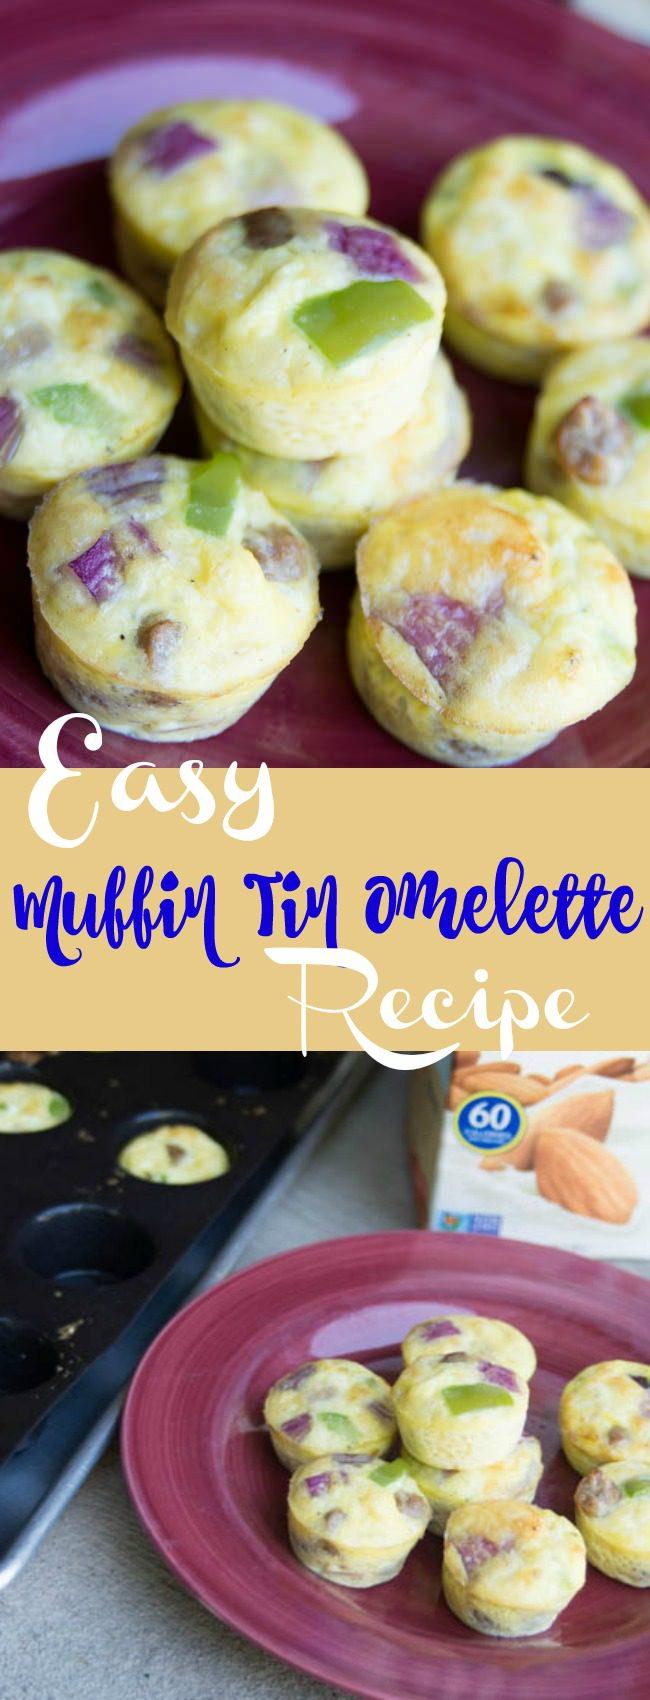 muffin-tin-egg-recipe